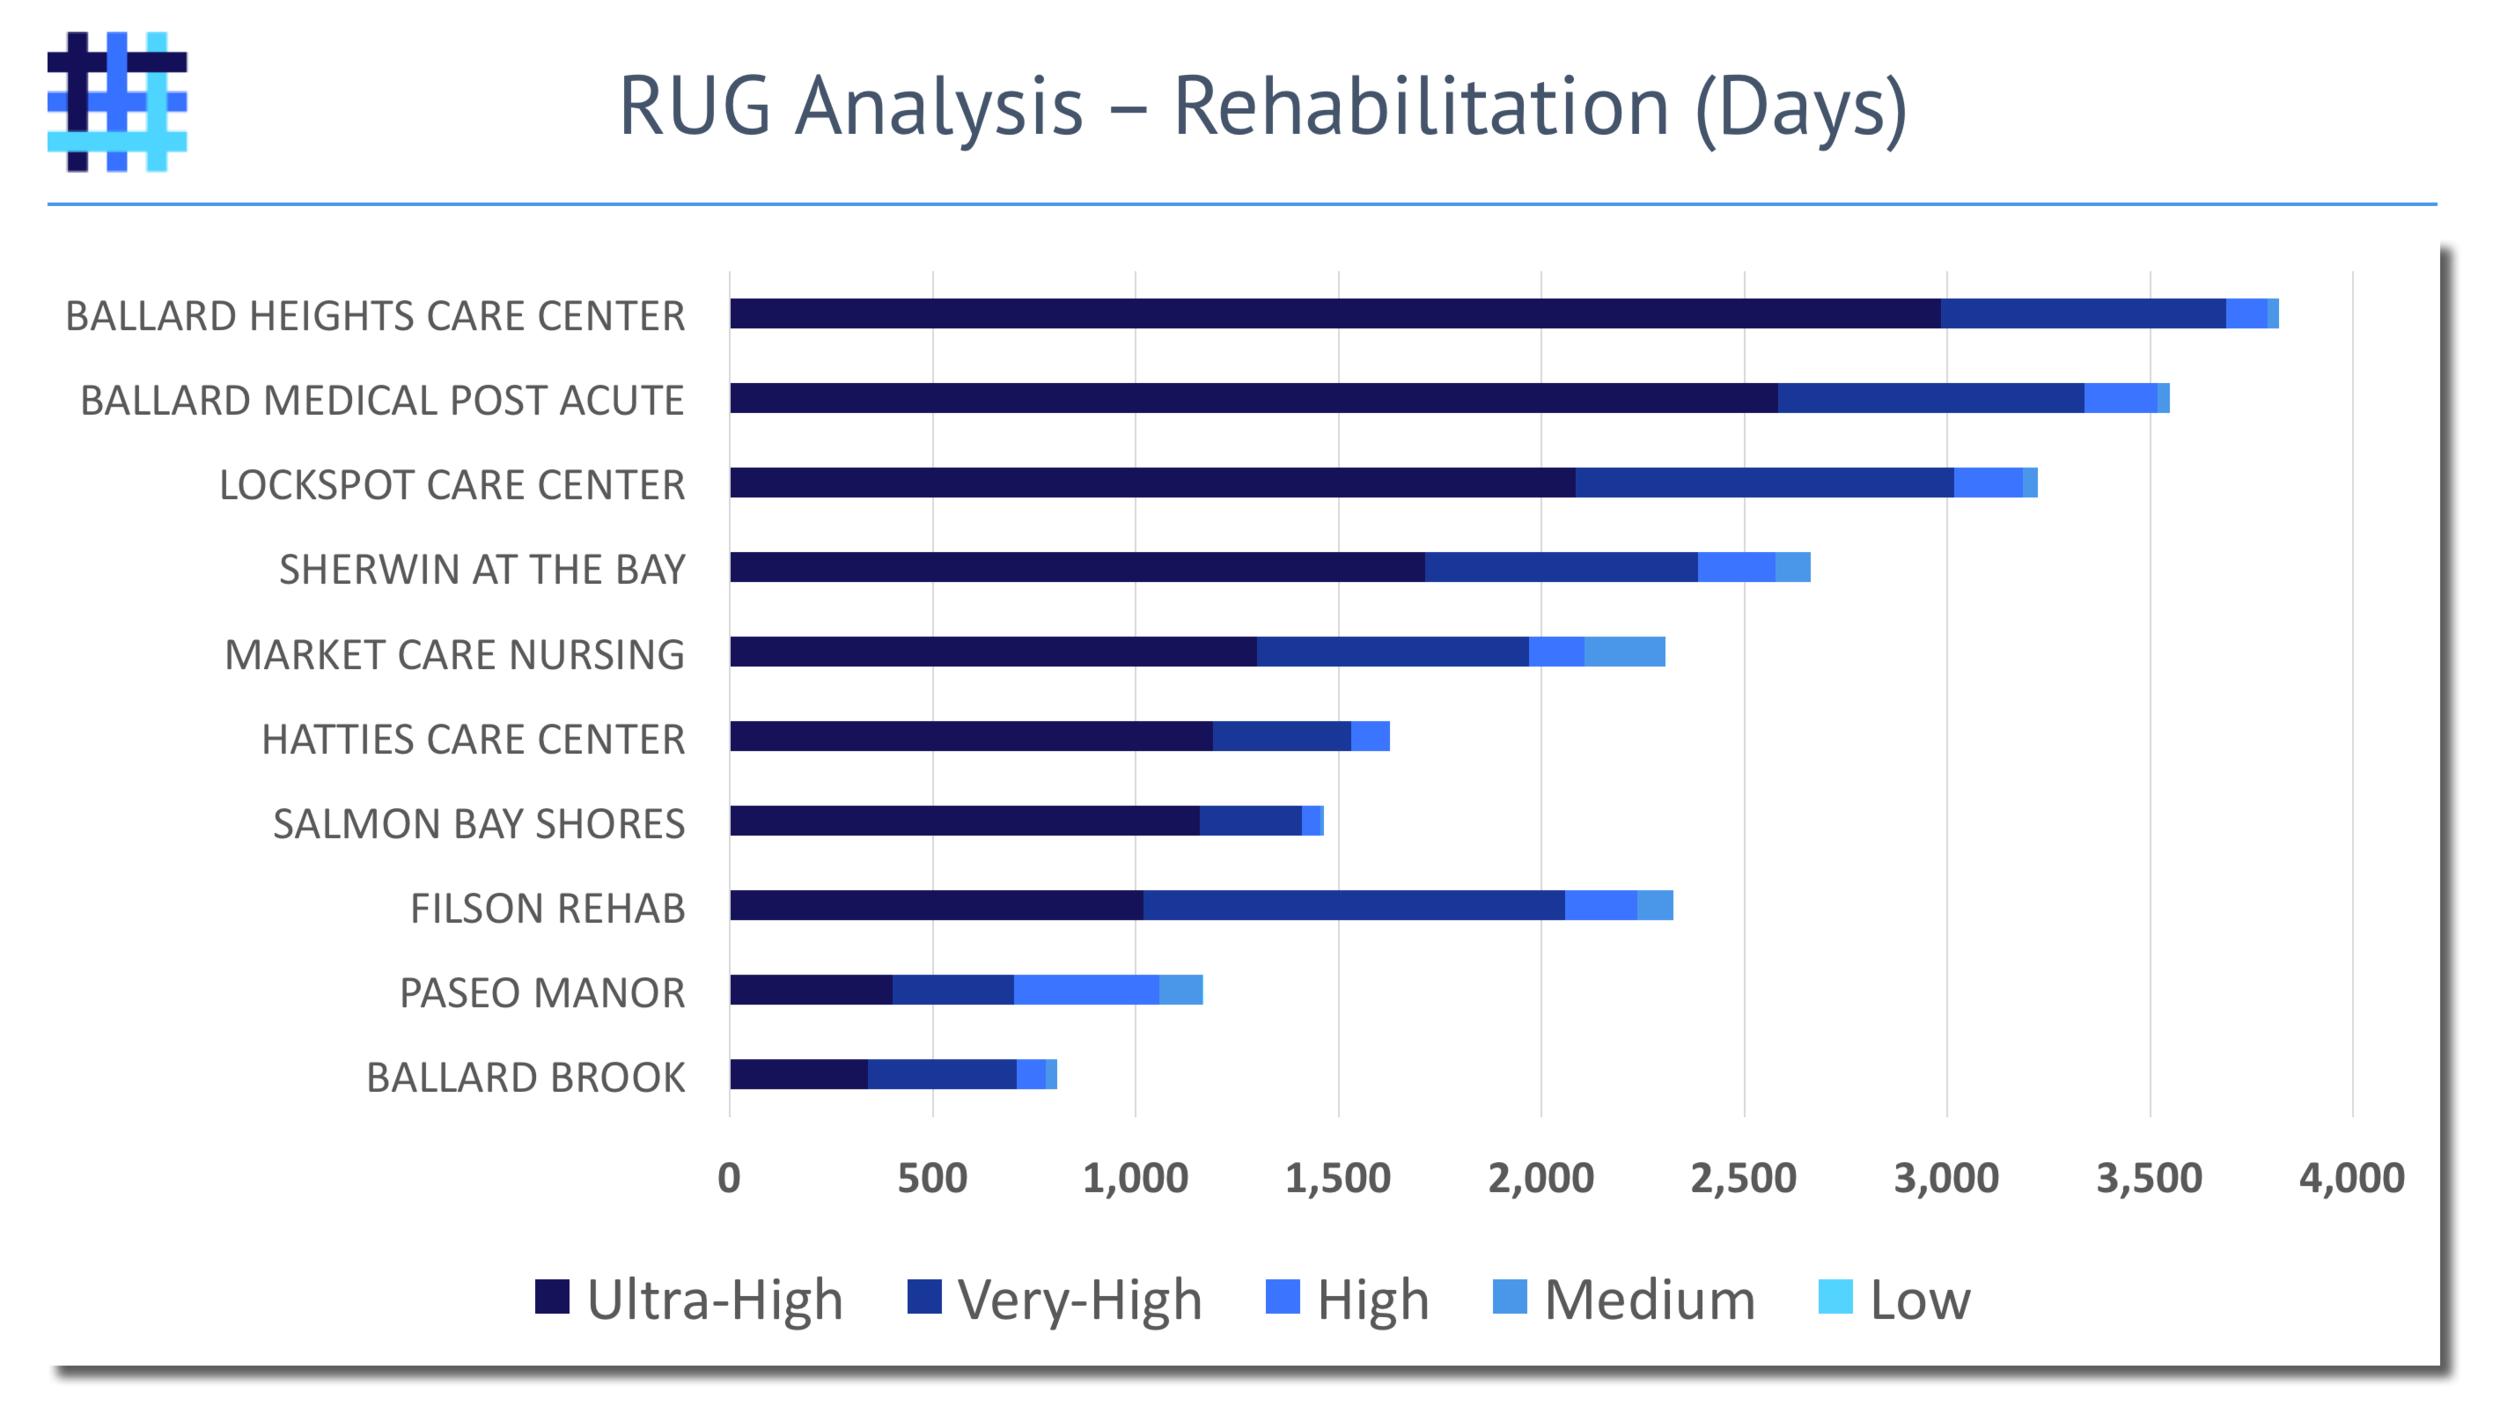 Nursing Home Resource Utilization Group (RUG) Analysis - Rehabilitation